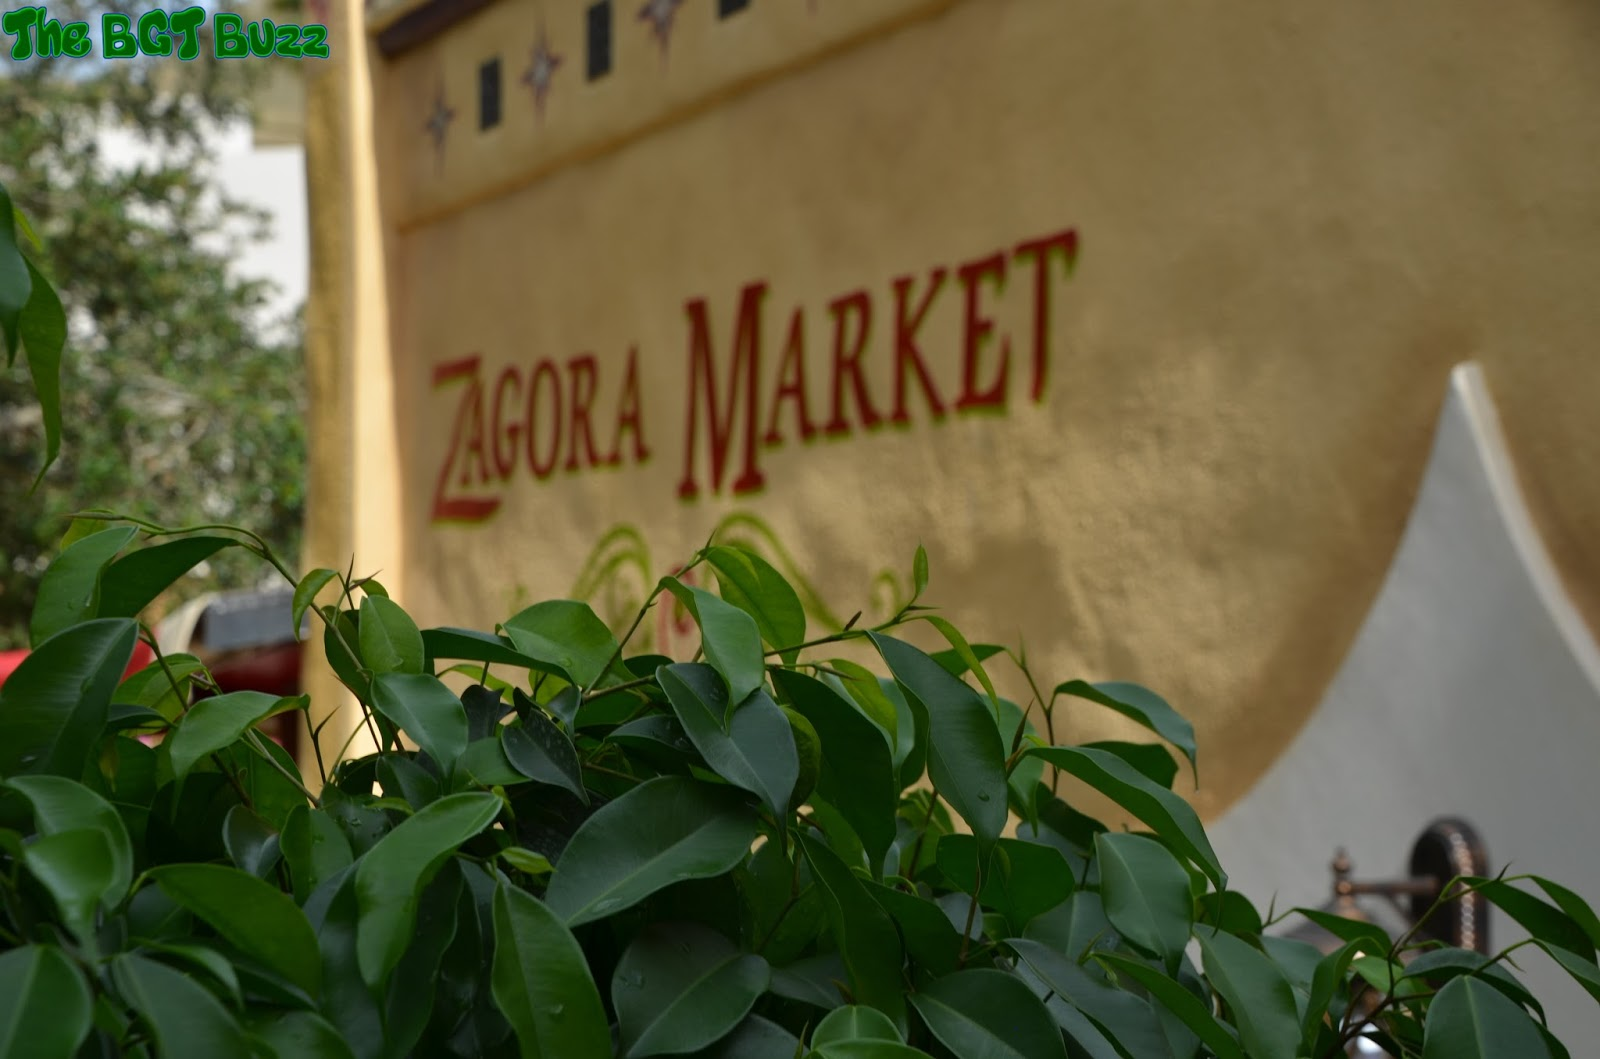 The BGT Buzz: The Zagora Market Opens At Busch Gardens Tampa!